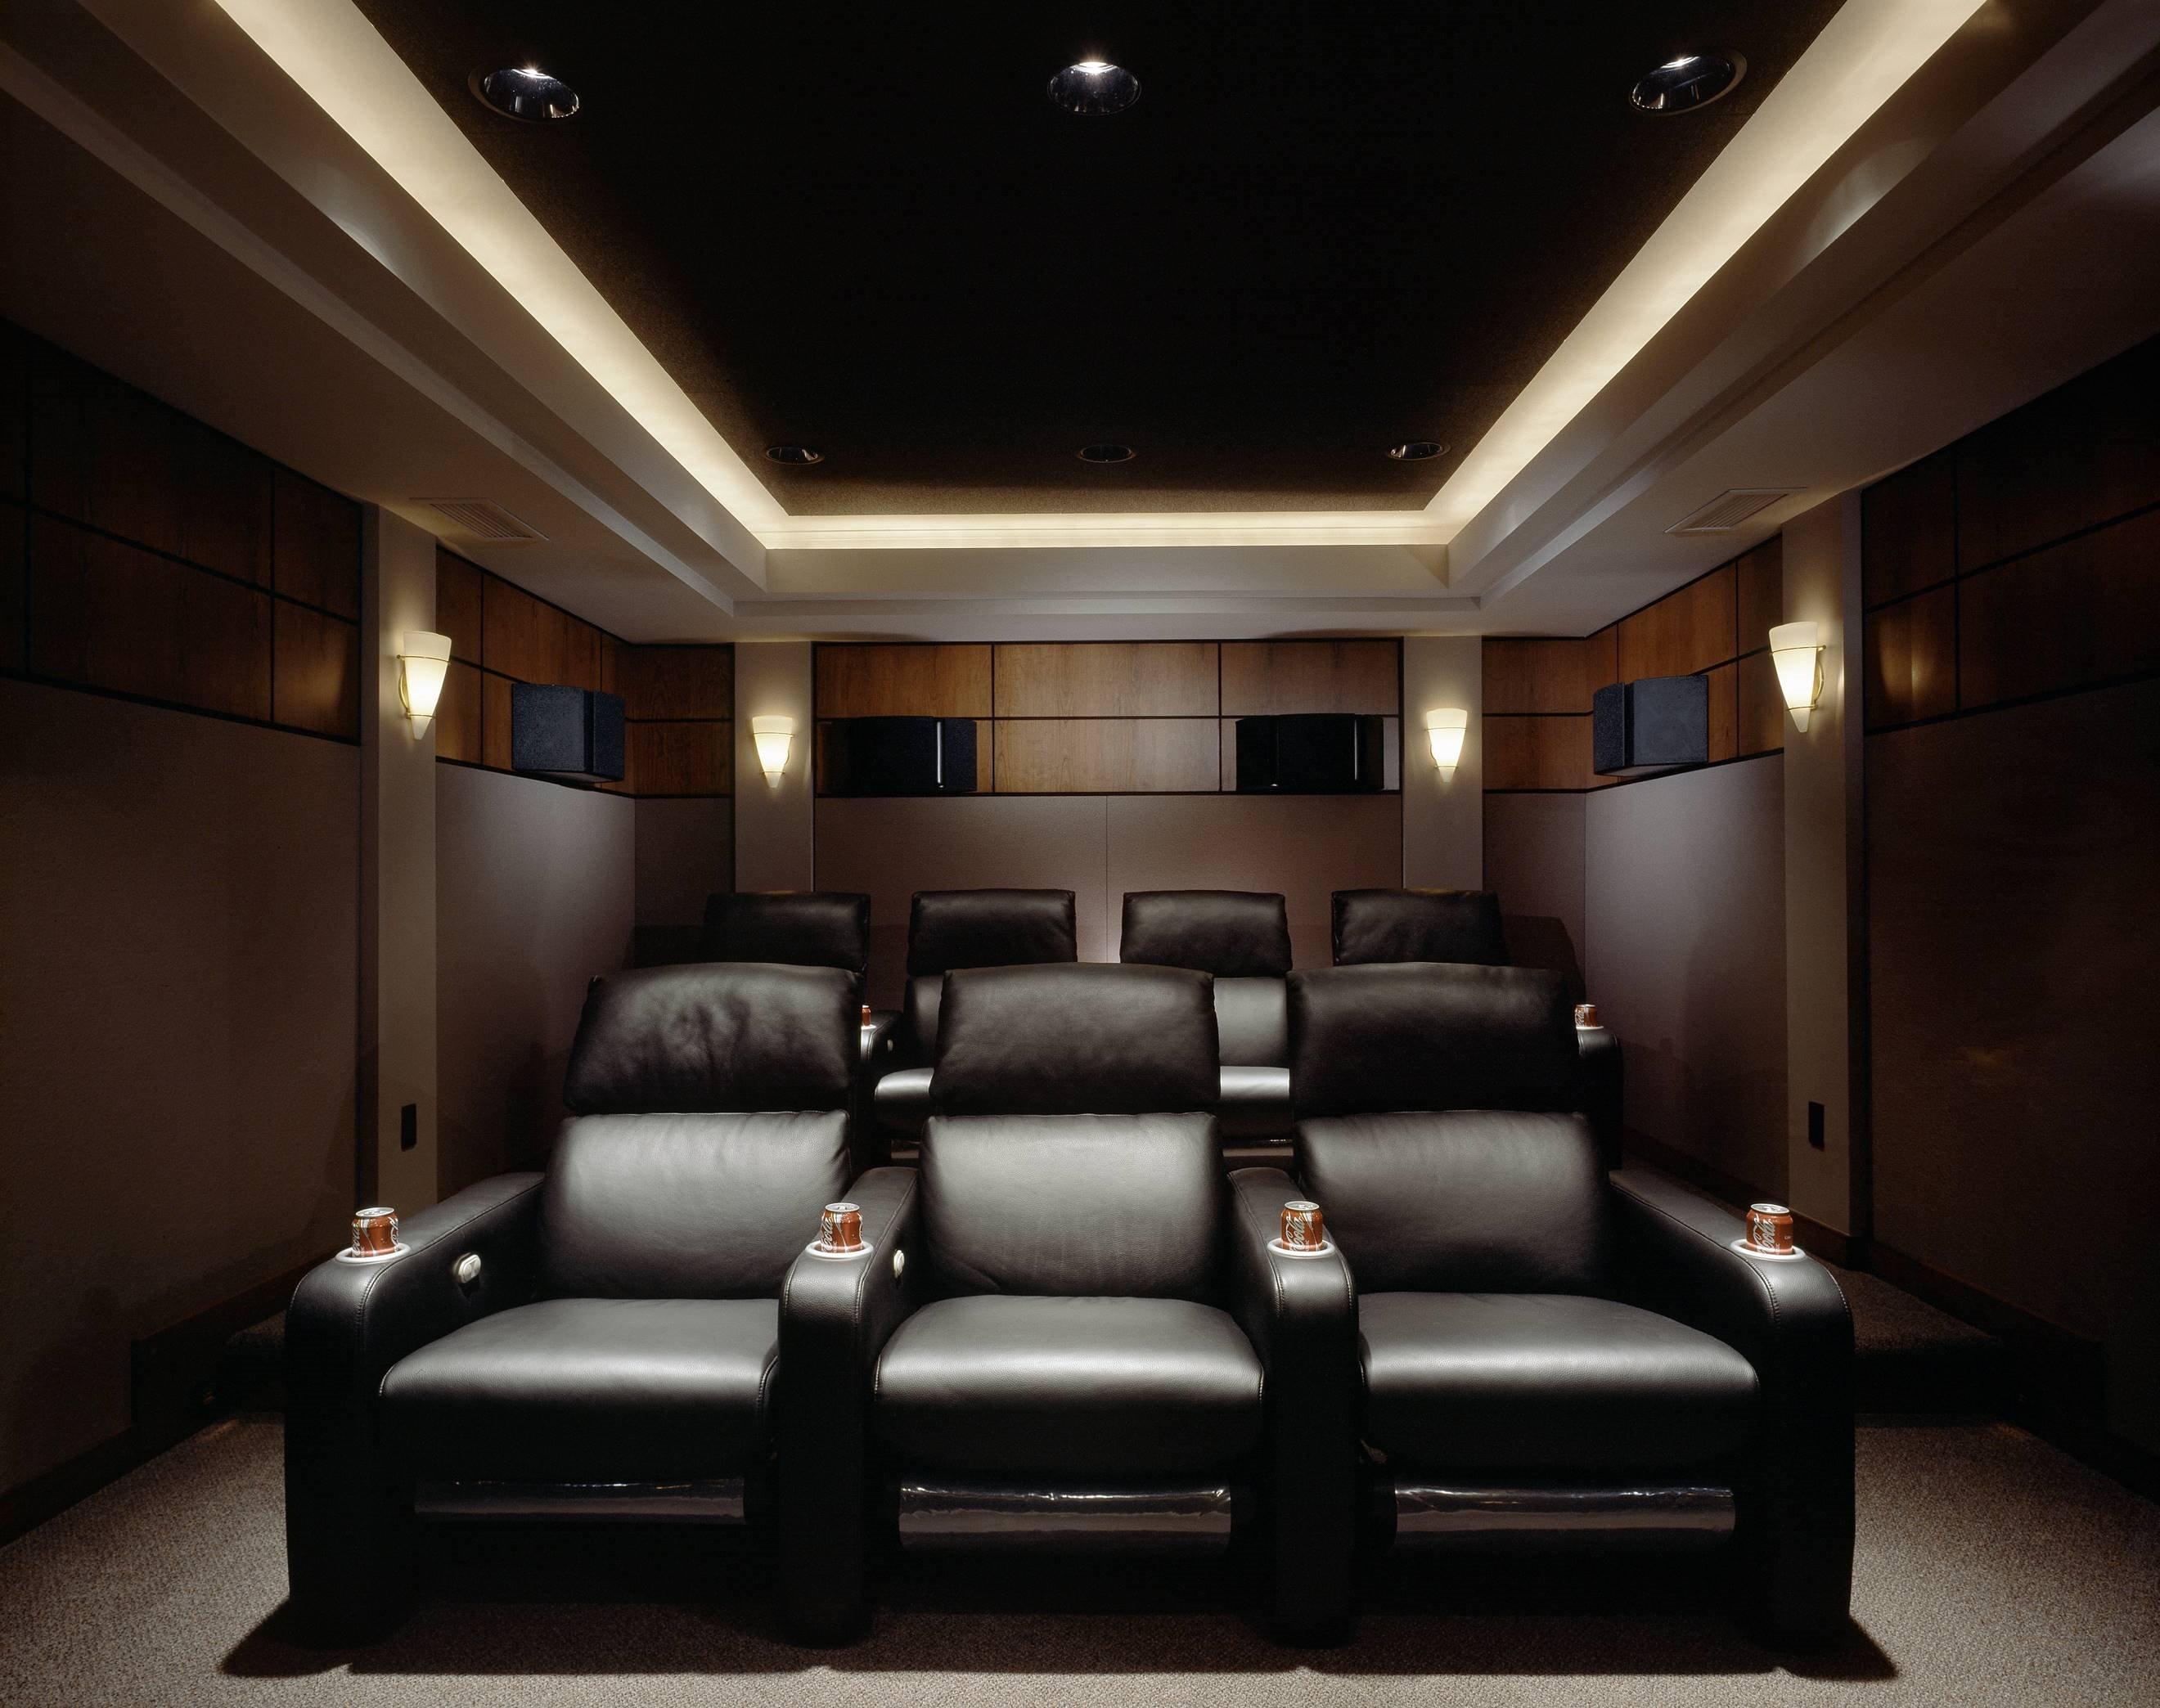 25 Inspirational Modern Home Movie Theater Design Ideas